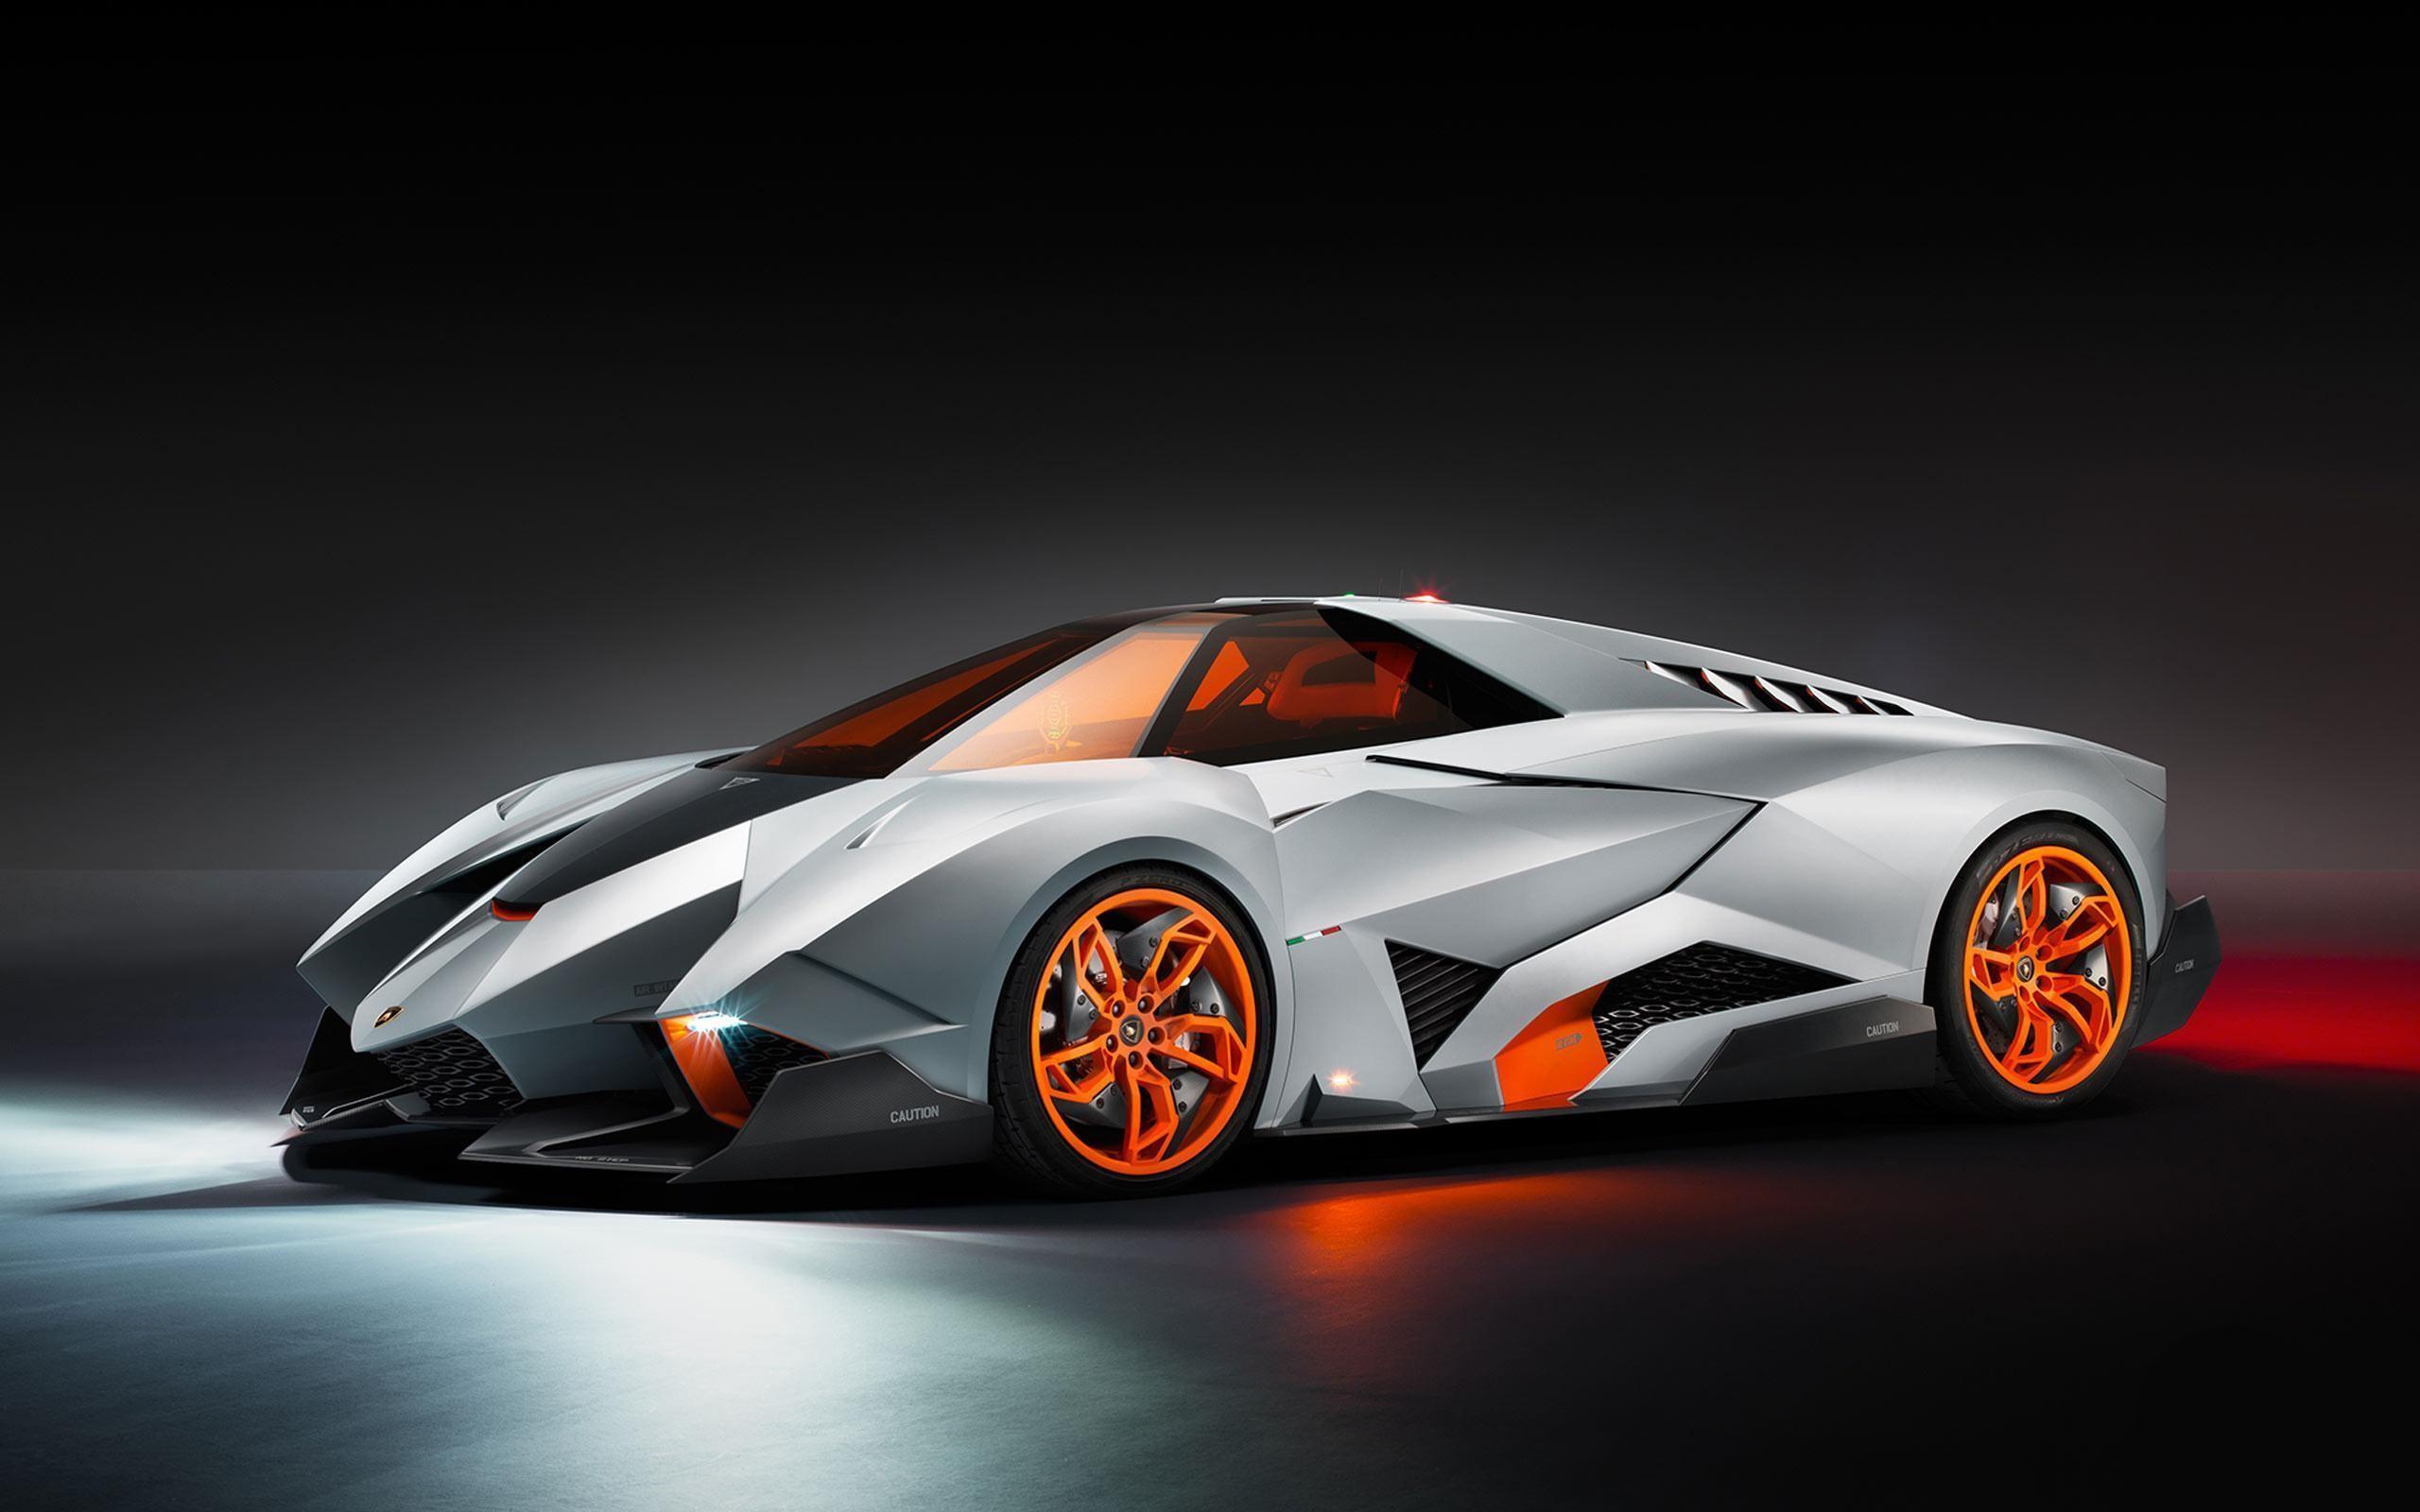 Marvelous Cool Car Hd Background Wallpaper 20 HD Wallpapers | Www . 2560x1600